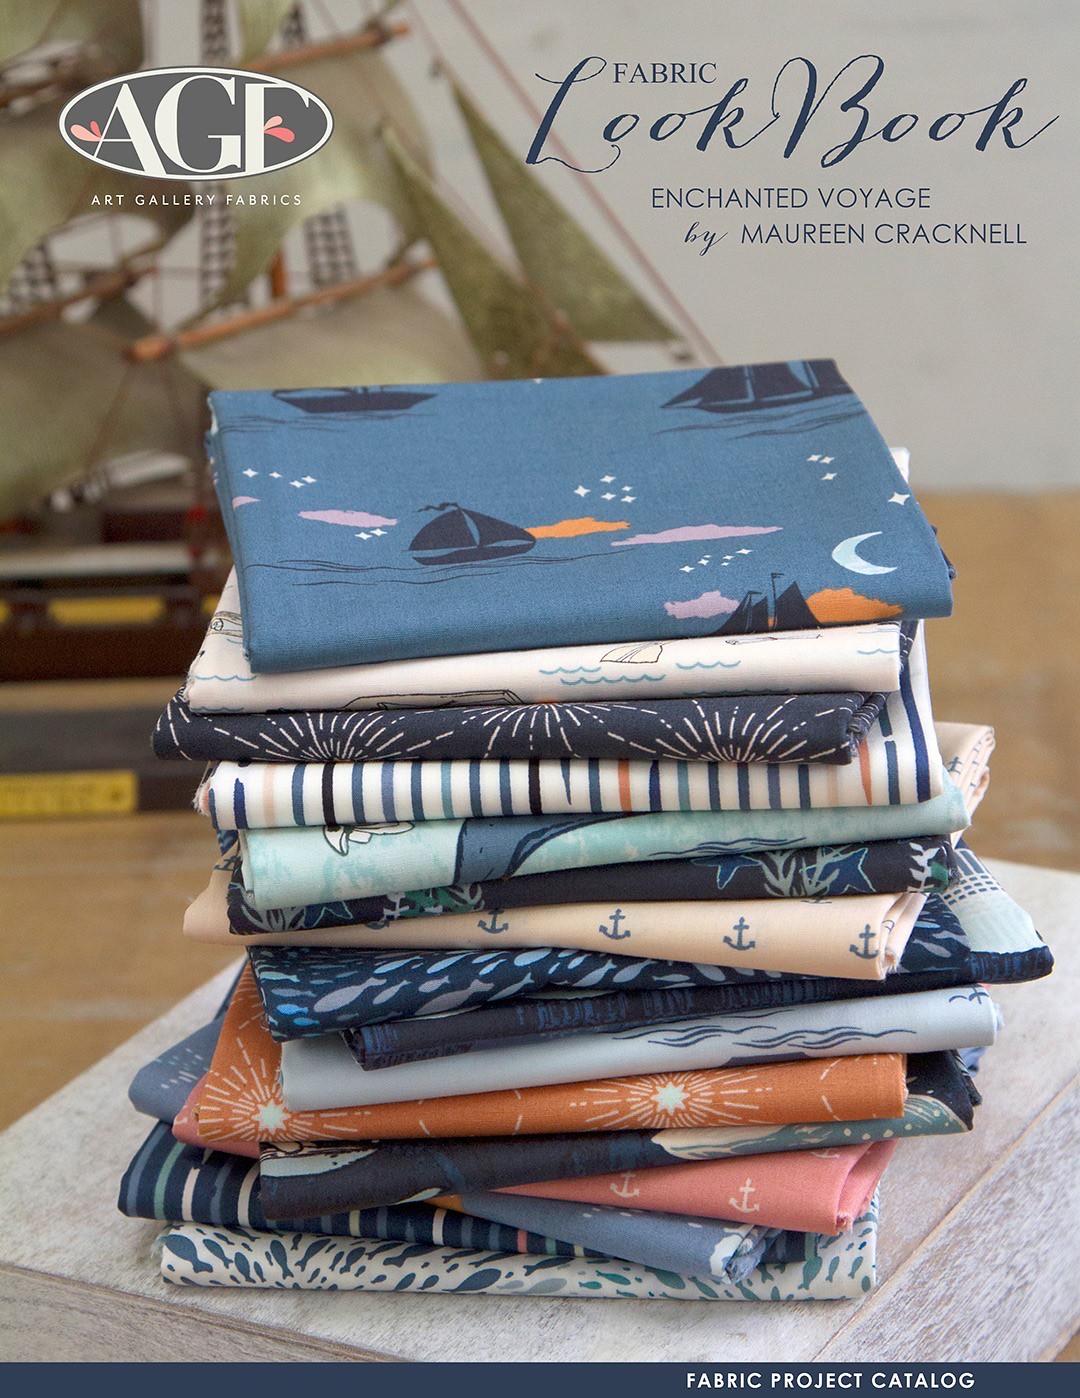 The Enchanted Voyage LookBook